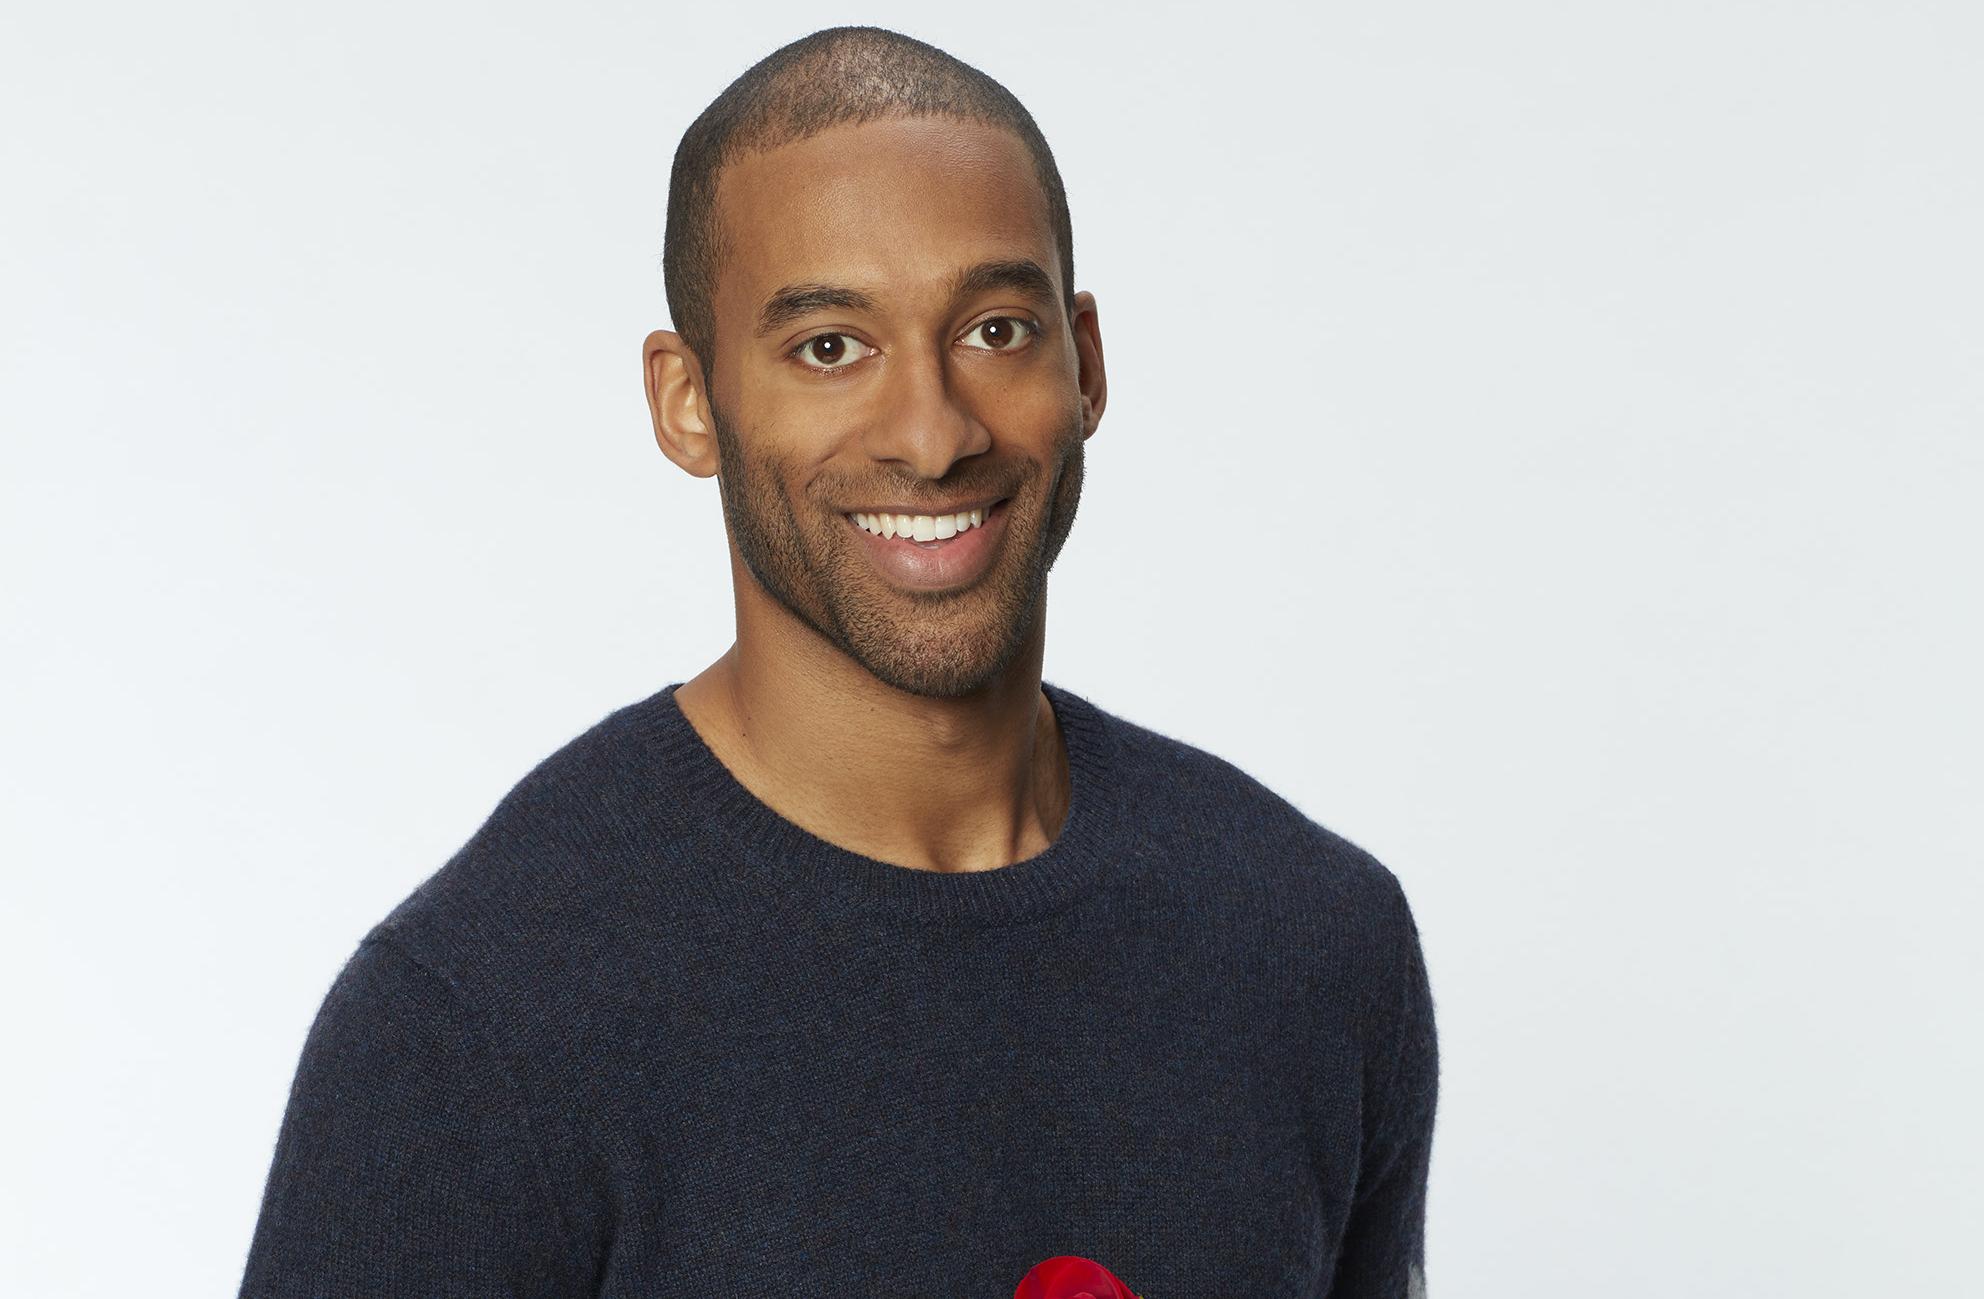 The Bachelor casts first black male lead Matt James